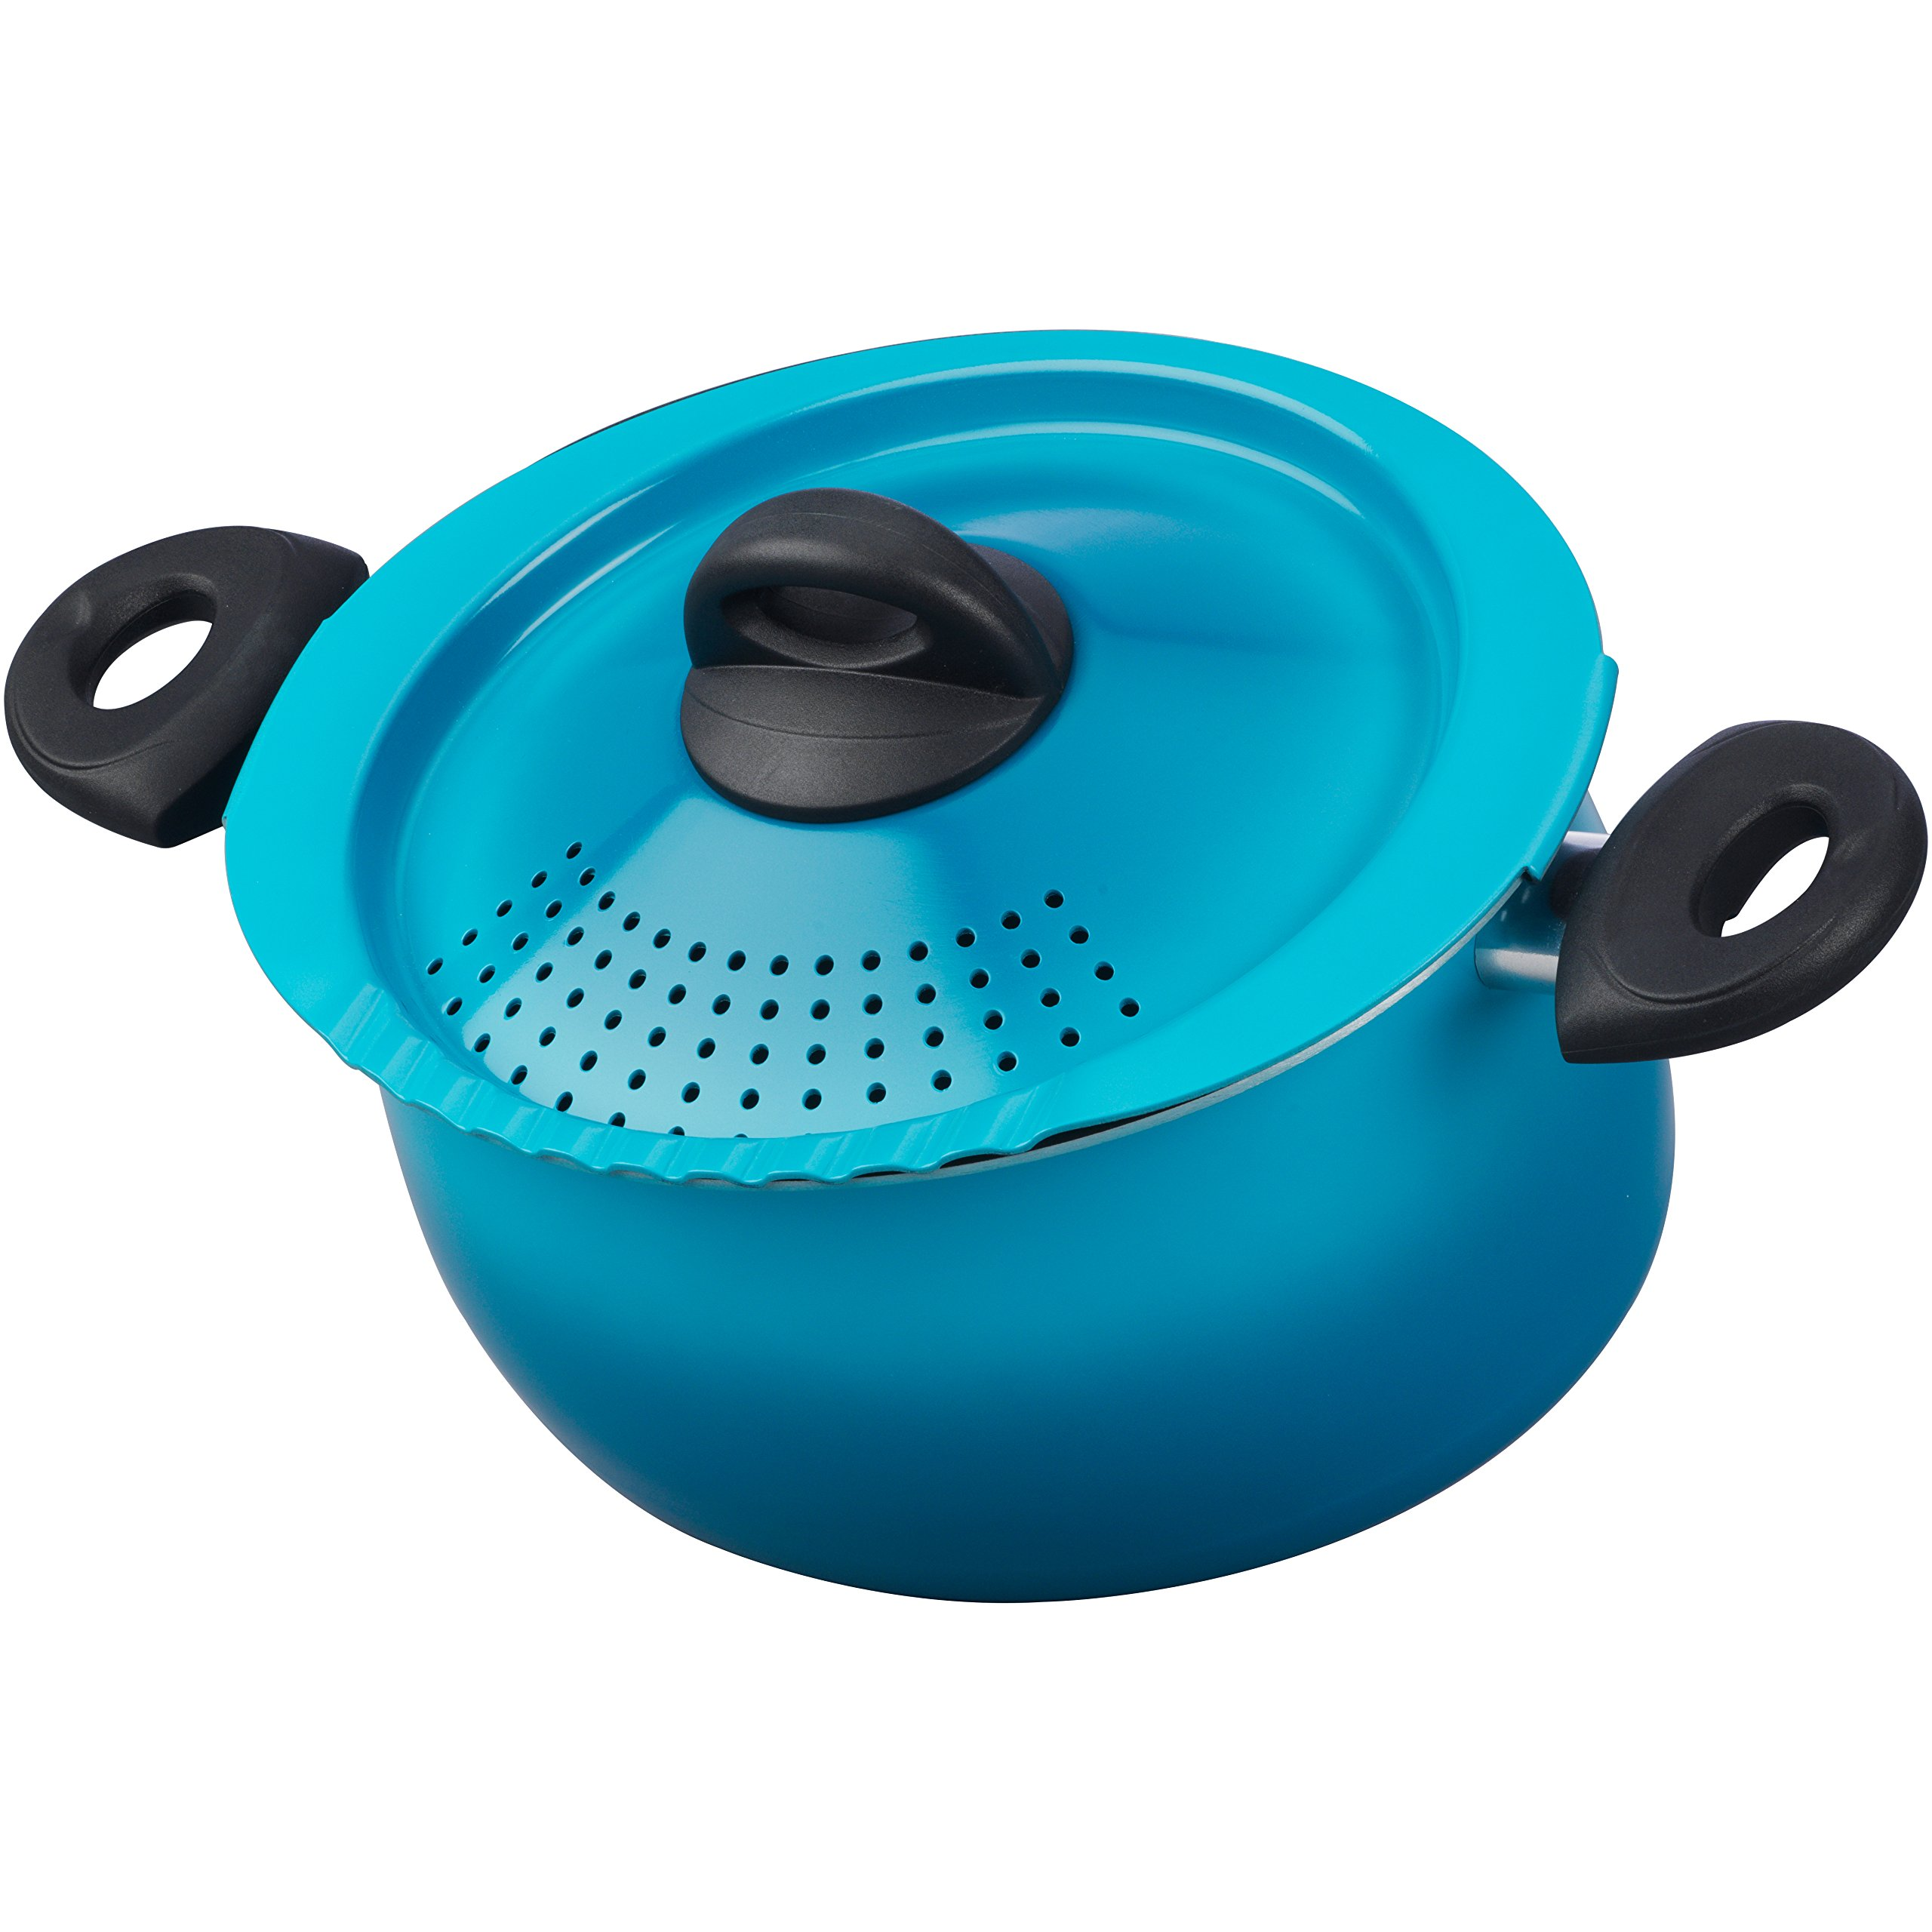 Bialetti 07548 Oval 5 Quart Pasta Pot with Strainer Lid, Nonstick, Coastal Blue